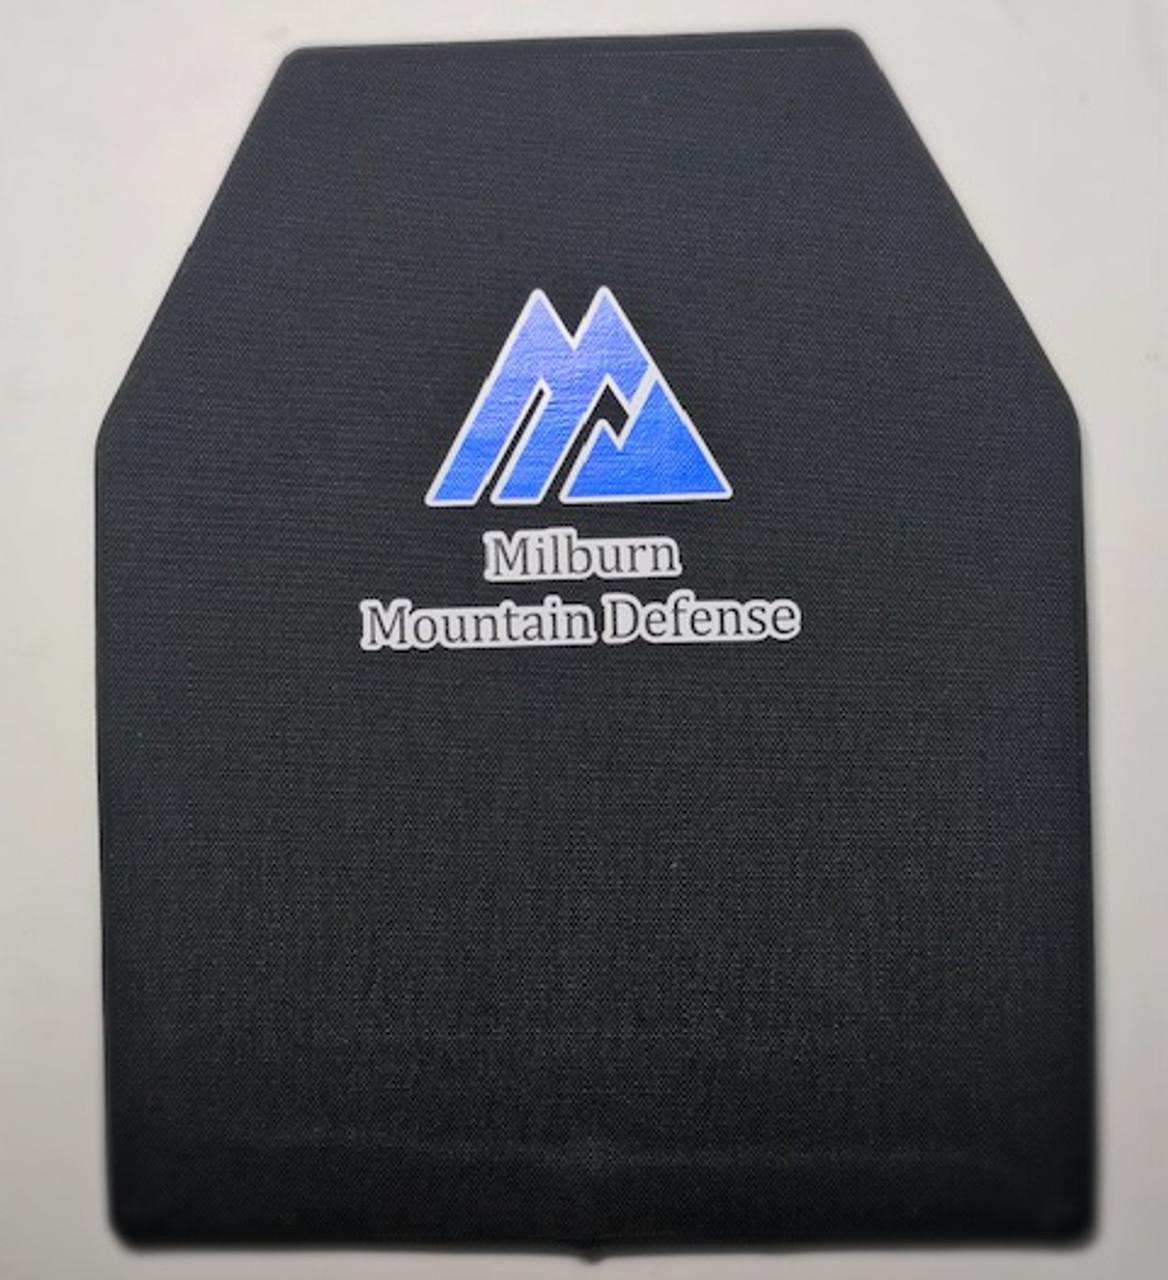 Milburn Mountain Defense Level IIIA Shoters Cut 10x12 Soft Armour (2-Panels)